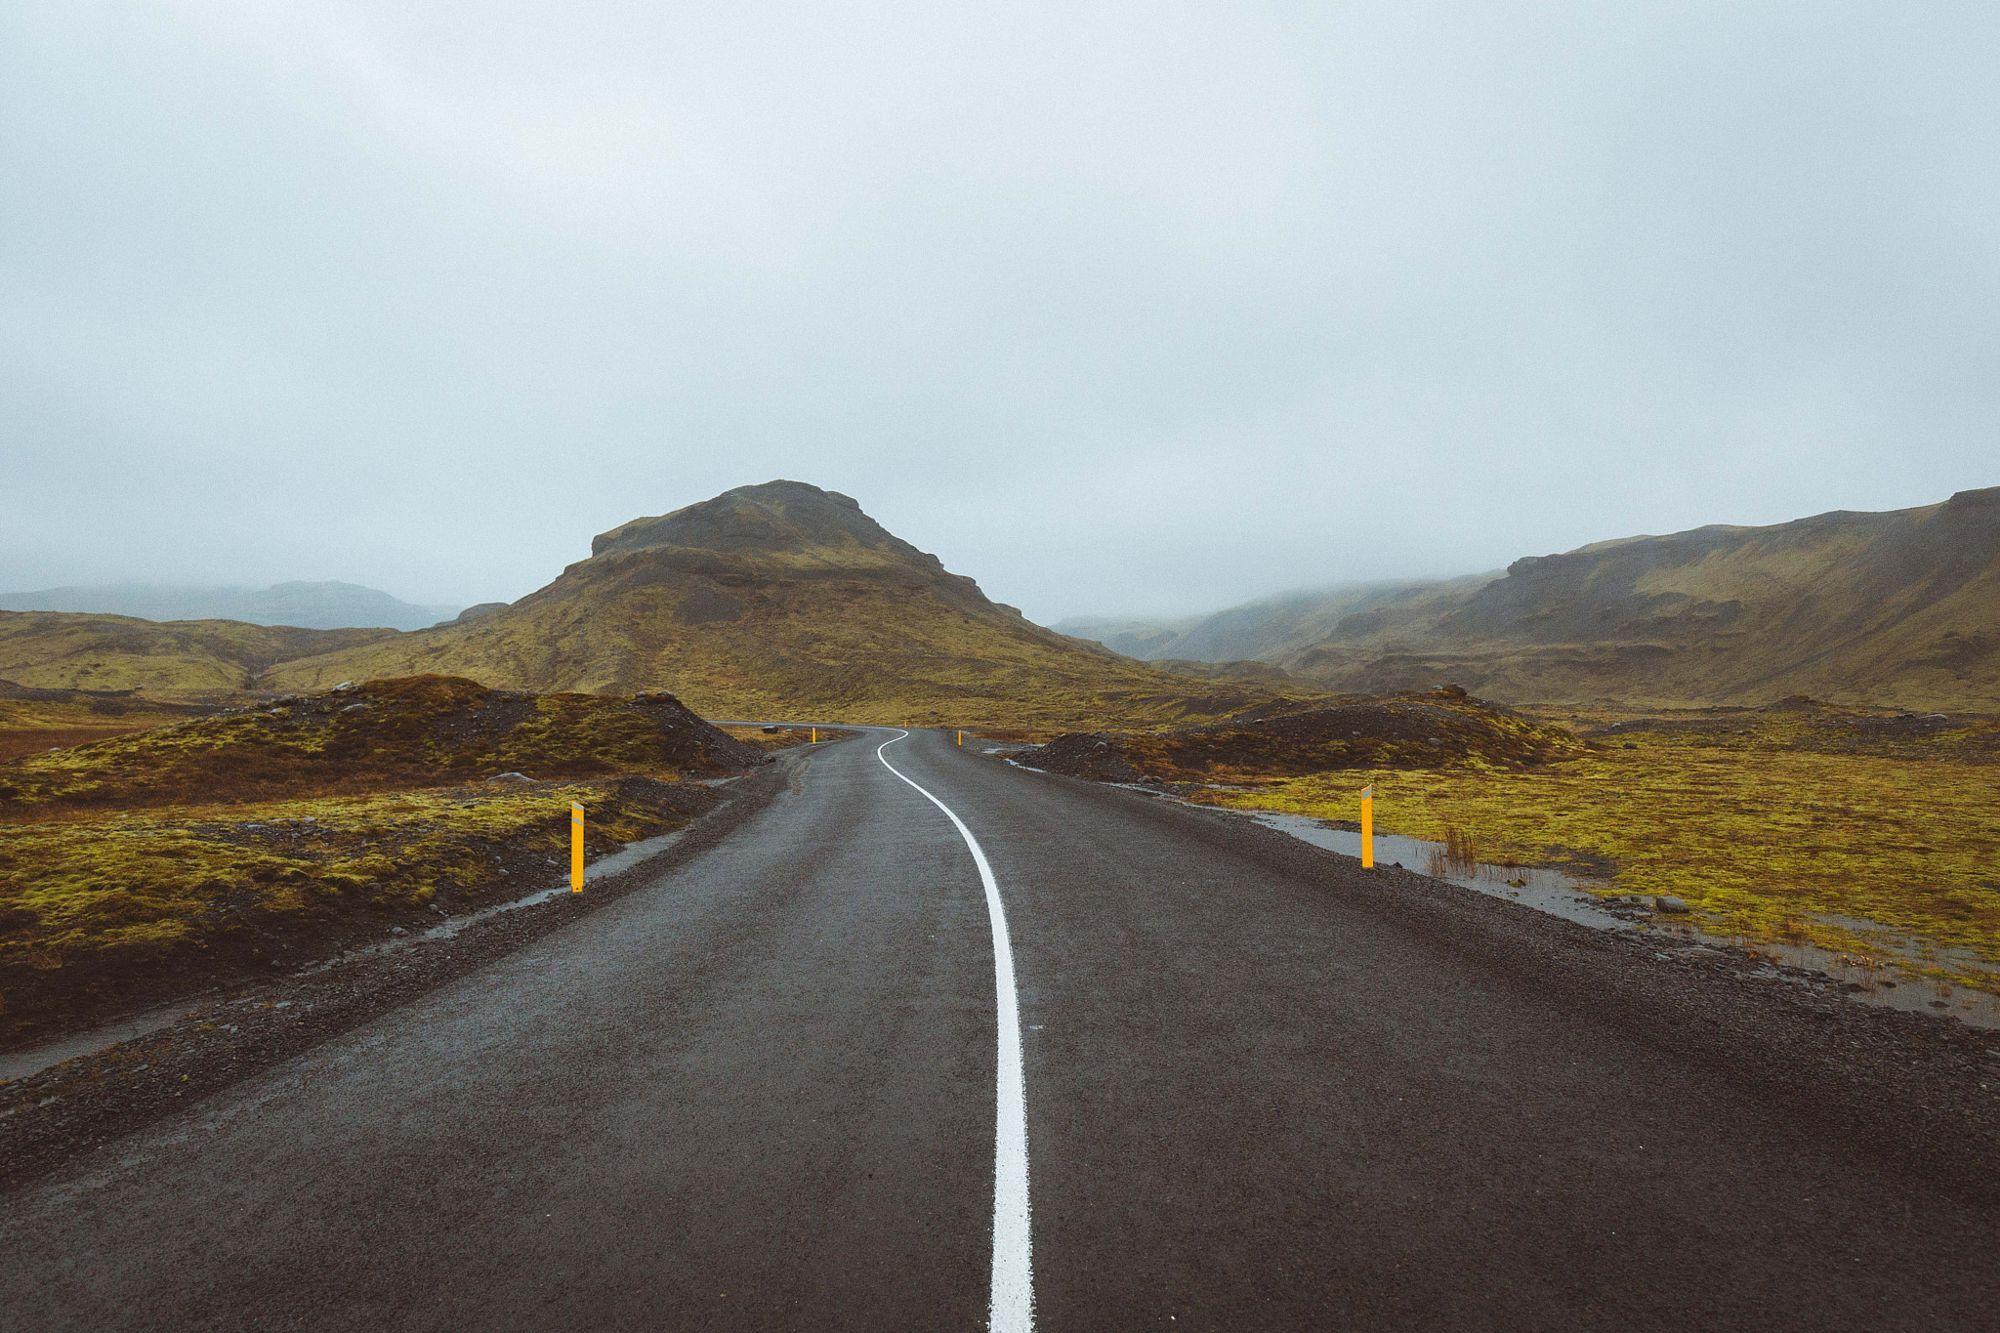 #500px Select #Photography : Icelandic roads by jakechamseddine https://t.co/Aqj14Hk0Cg | skylandscapenaturetra  #photography